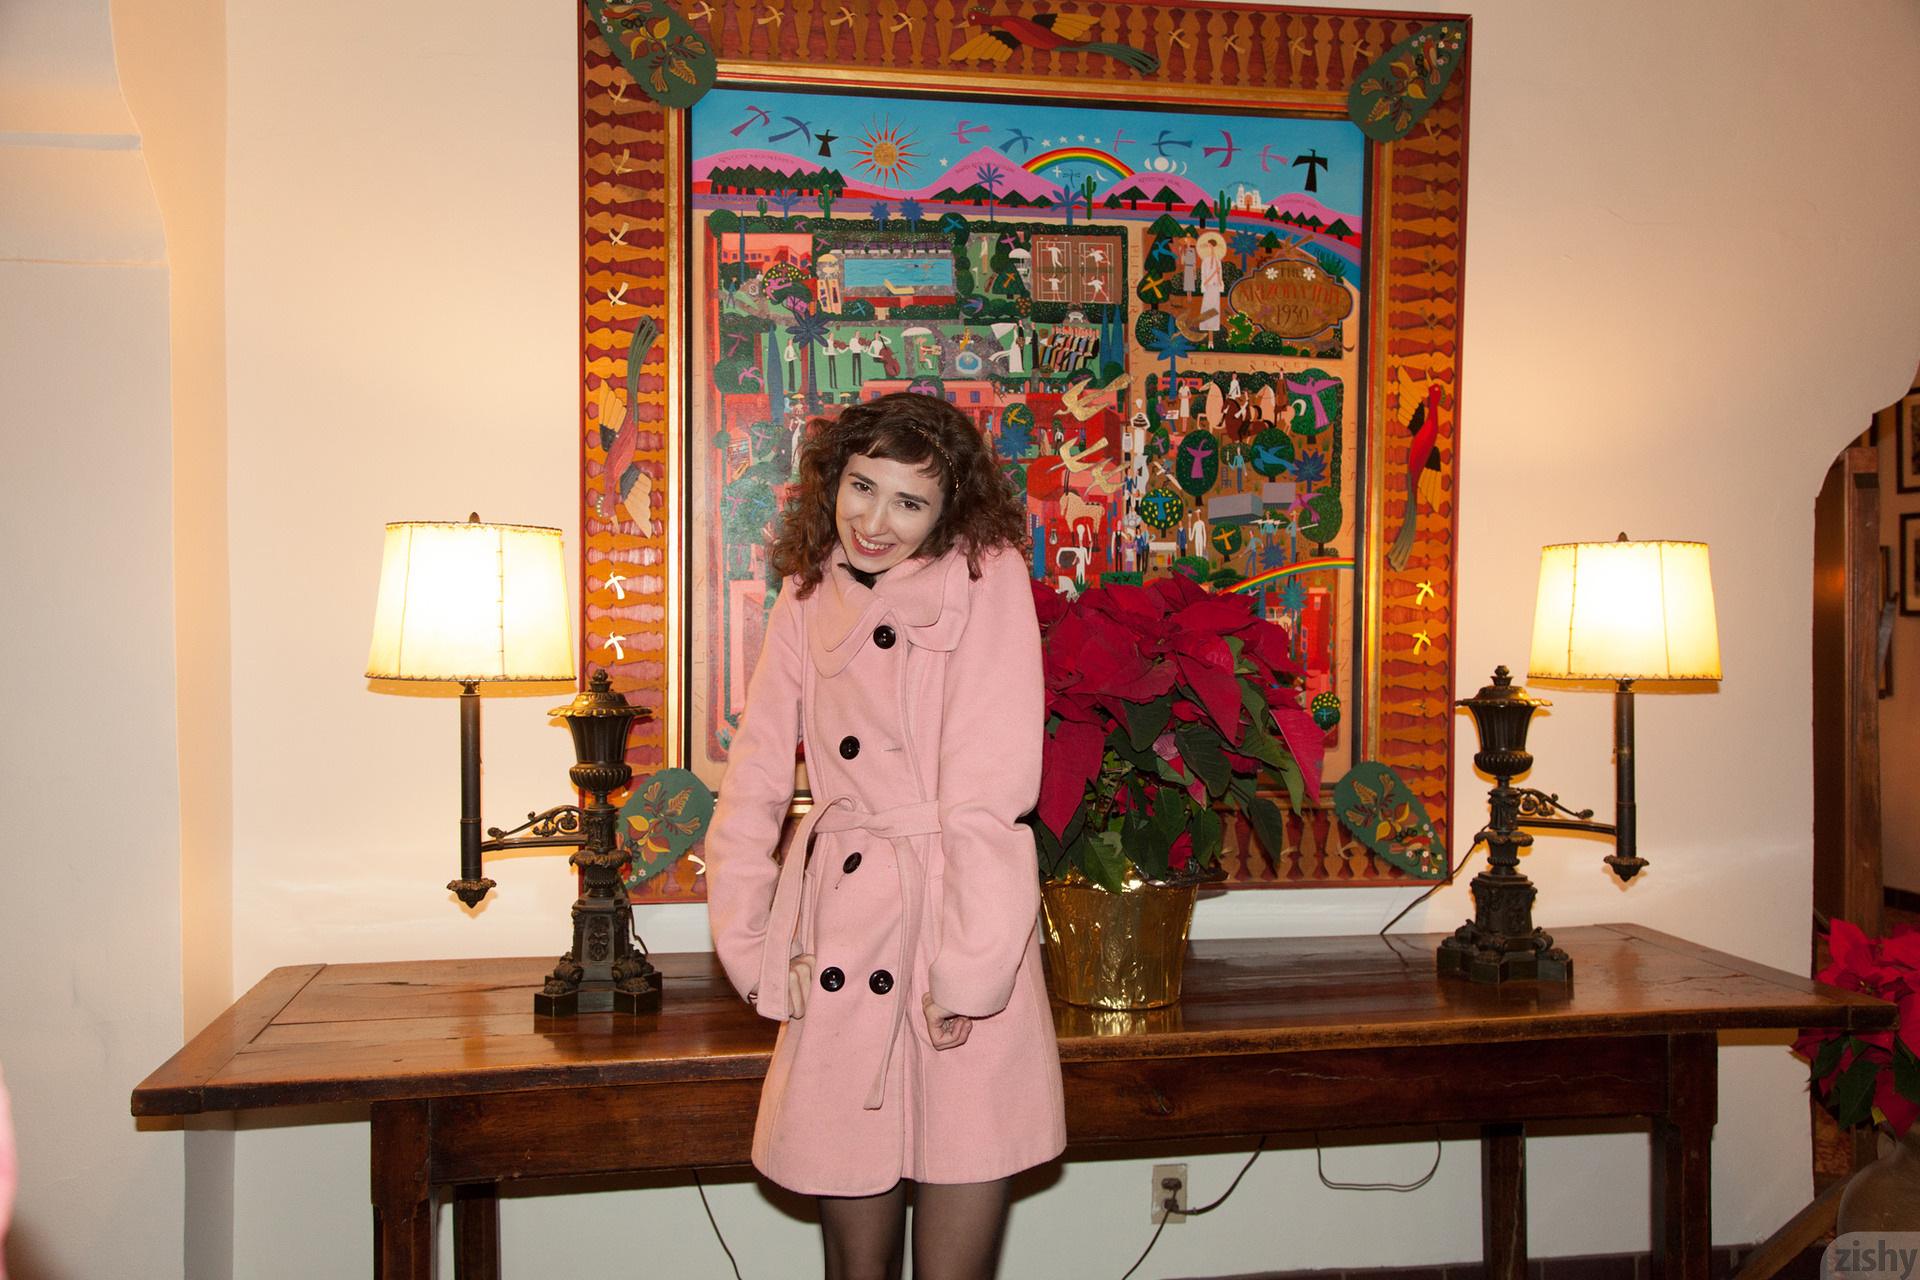 Yvette Nolot At Arizona Inn Zishy (61)